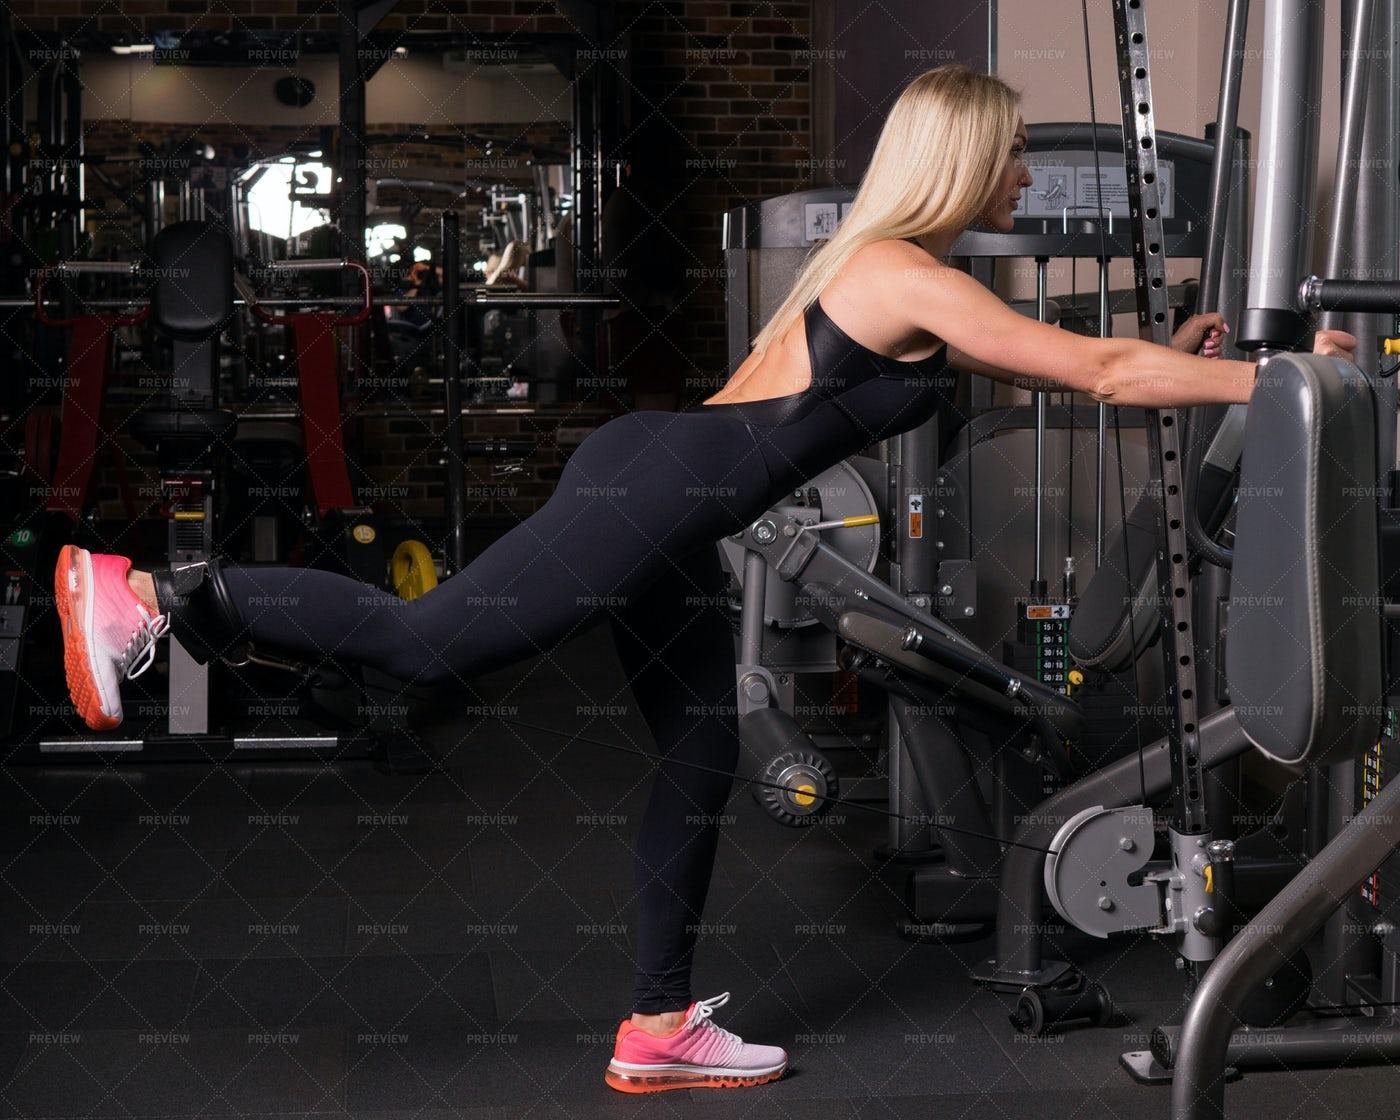 Fitness Woman Doing A Leg Rise: Stock Photos